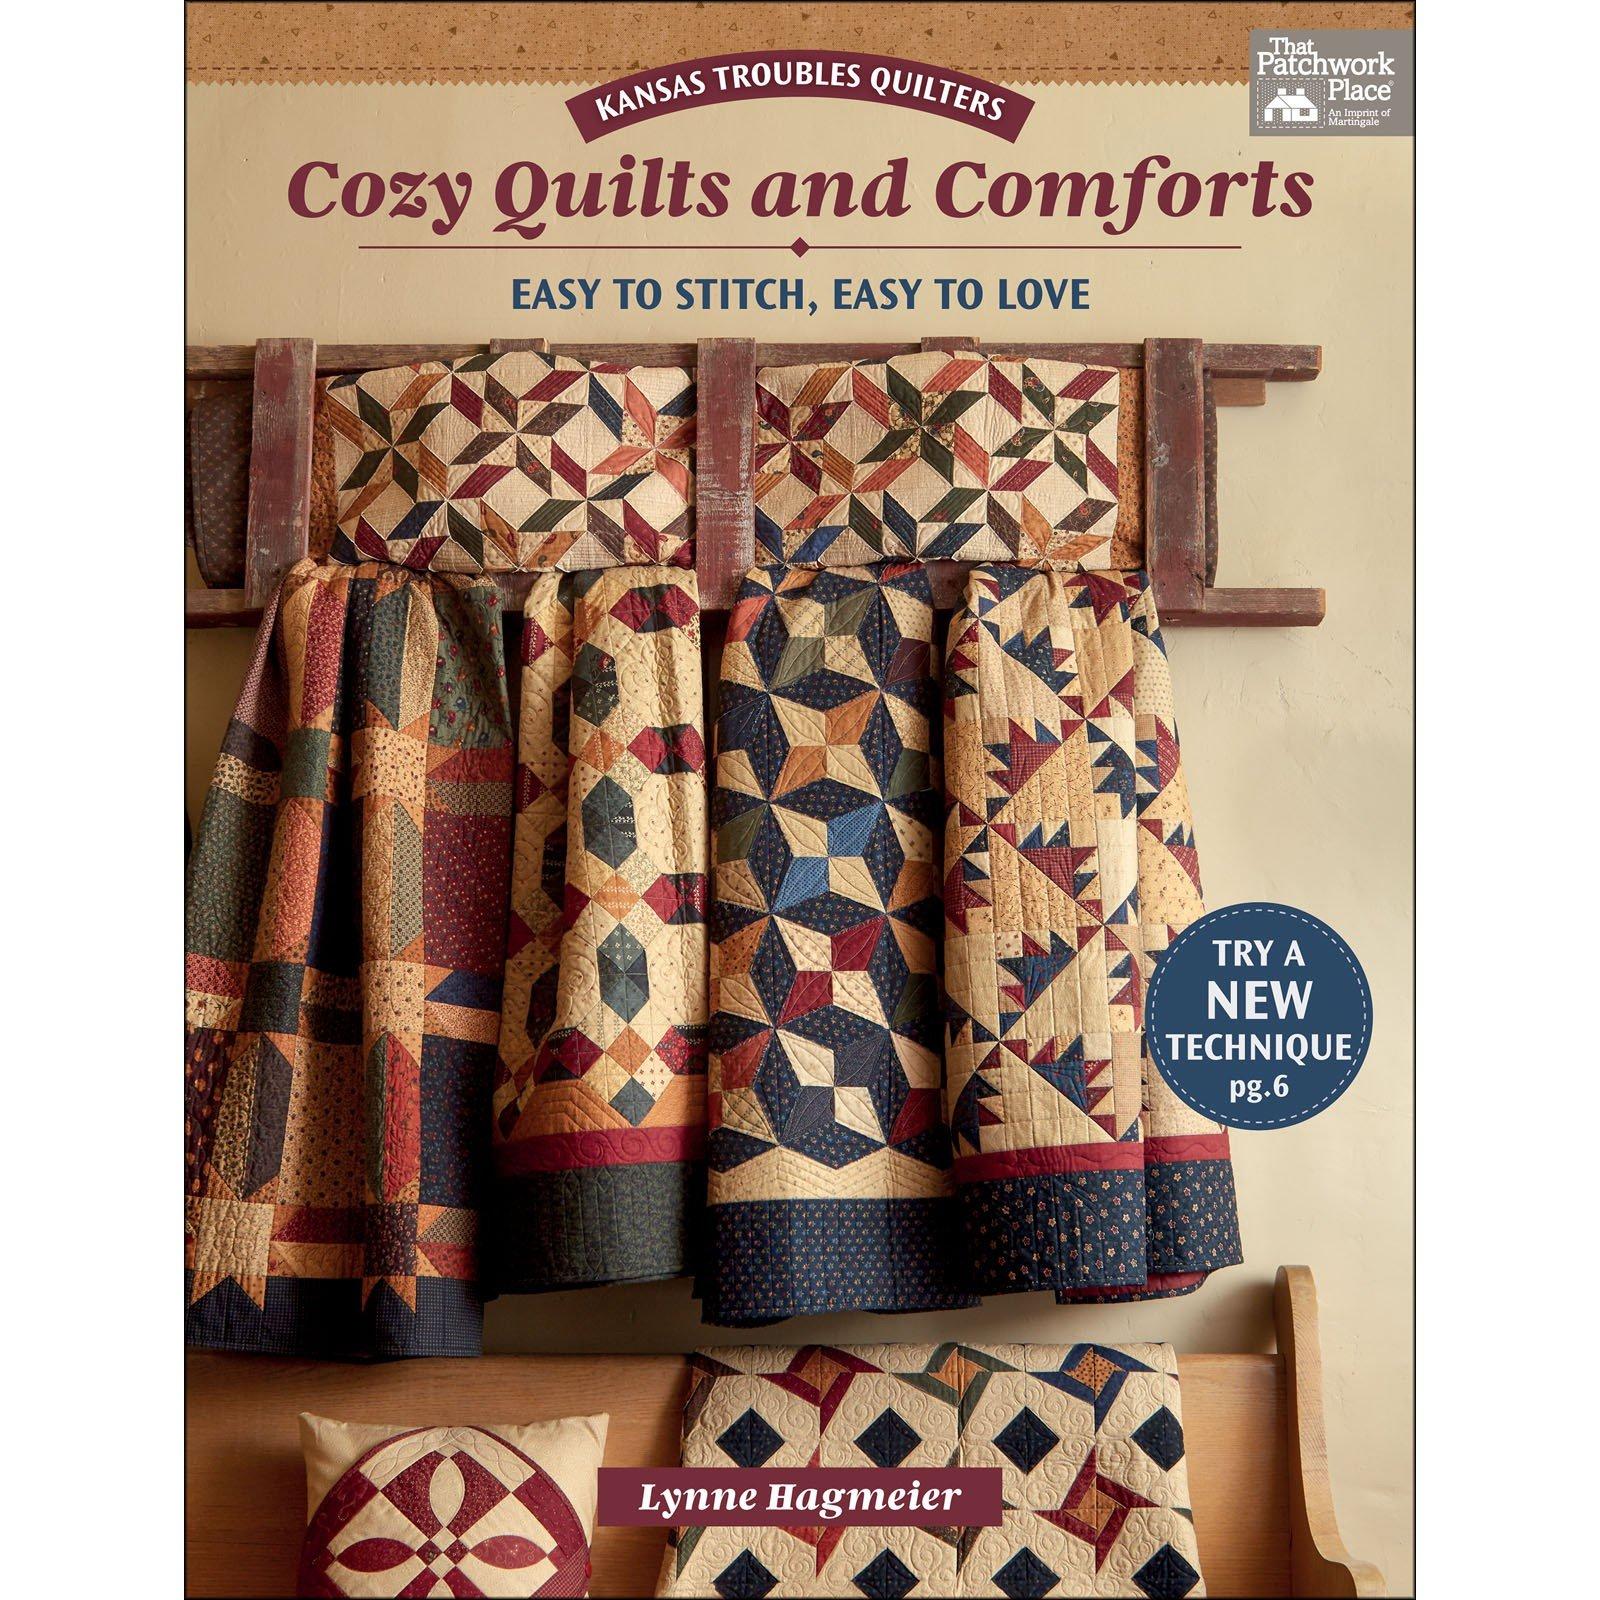 Cozy Quilts & Comforts<br/>Lynne Hagmeier